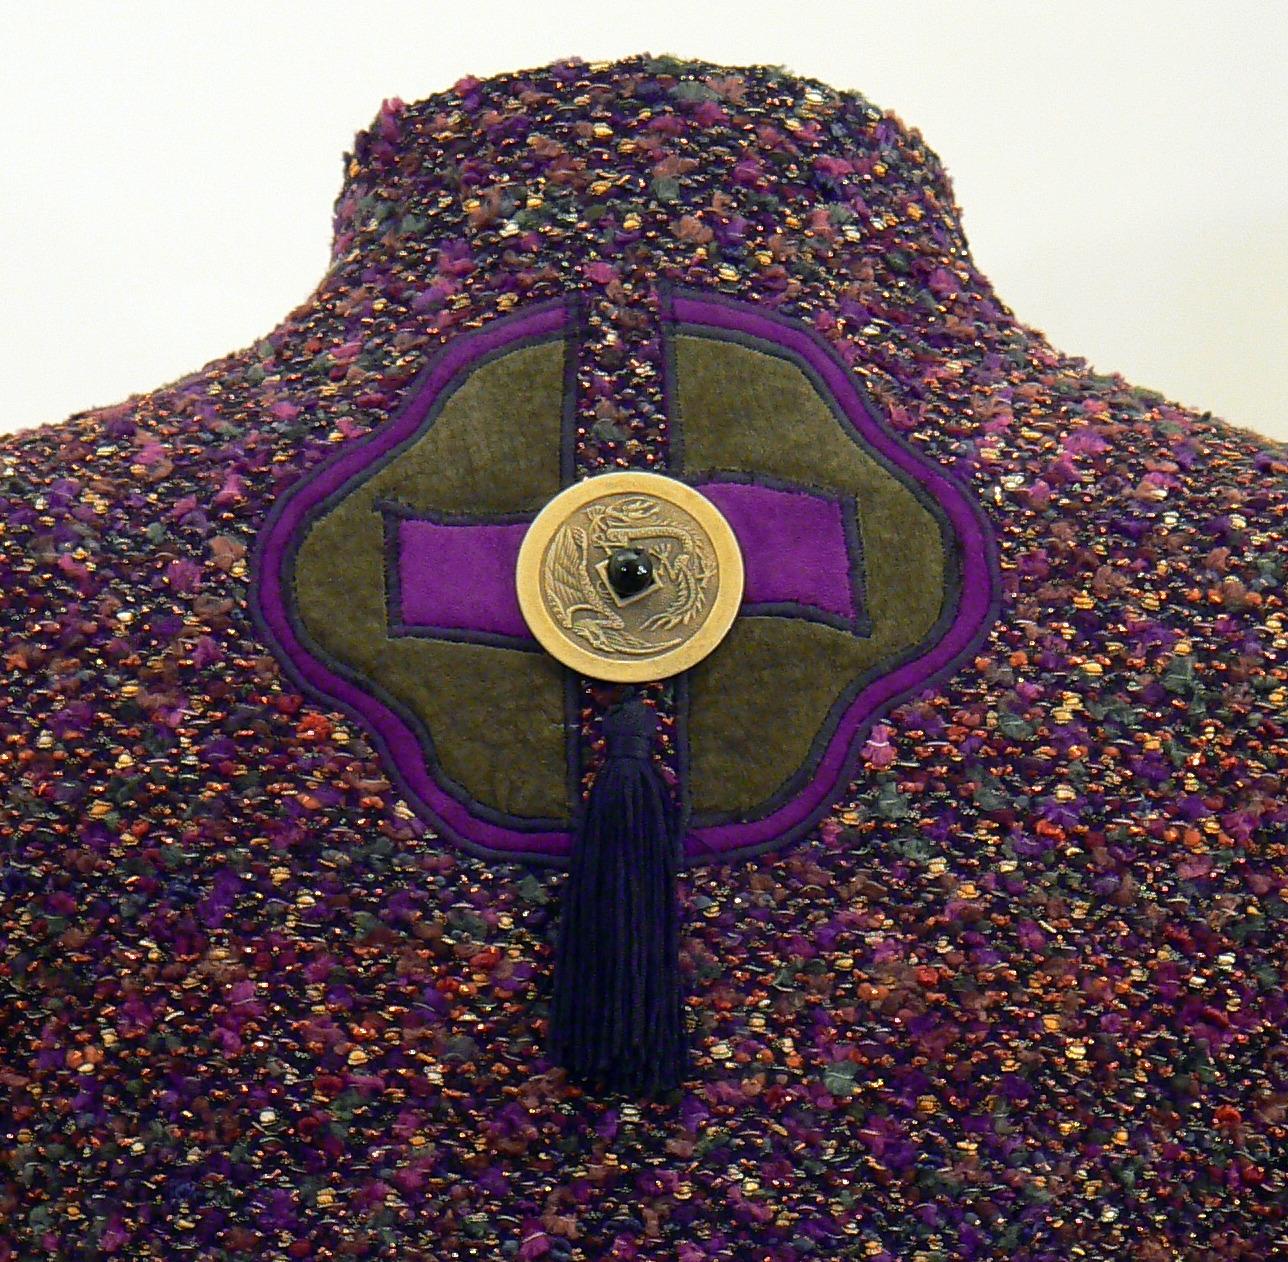 Handwoven Clothing, Coats, Kathleen Weir-West, 26-001.JPG